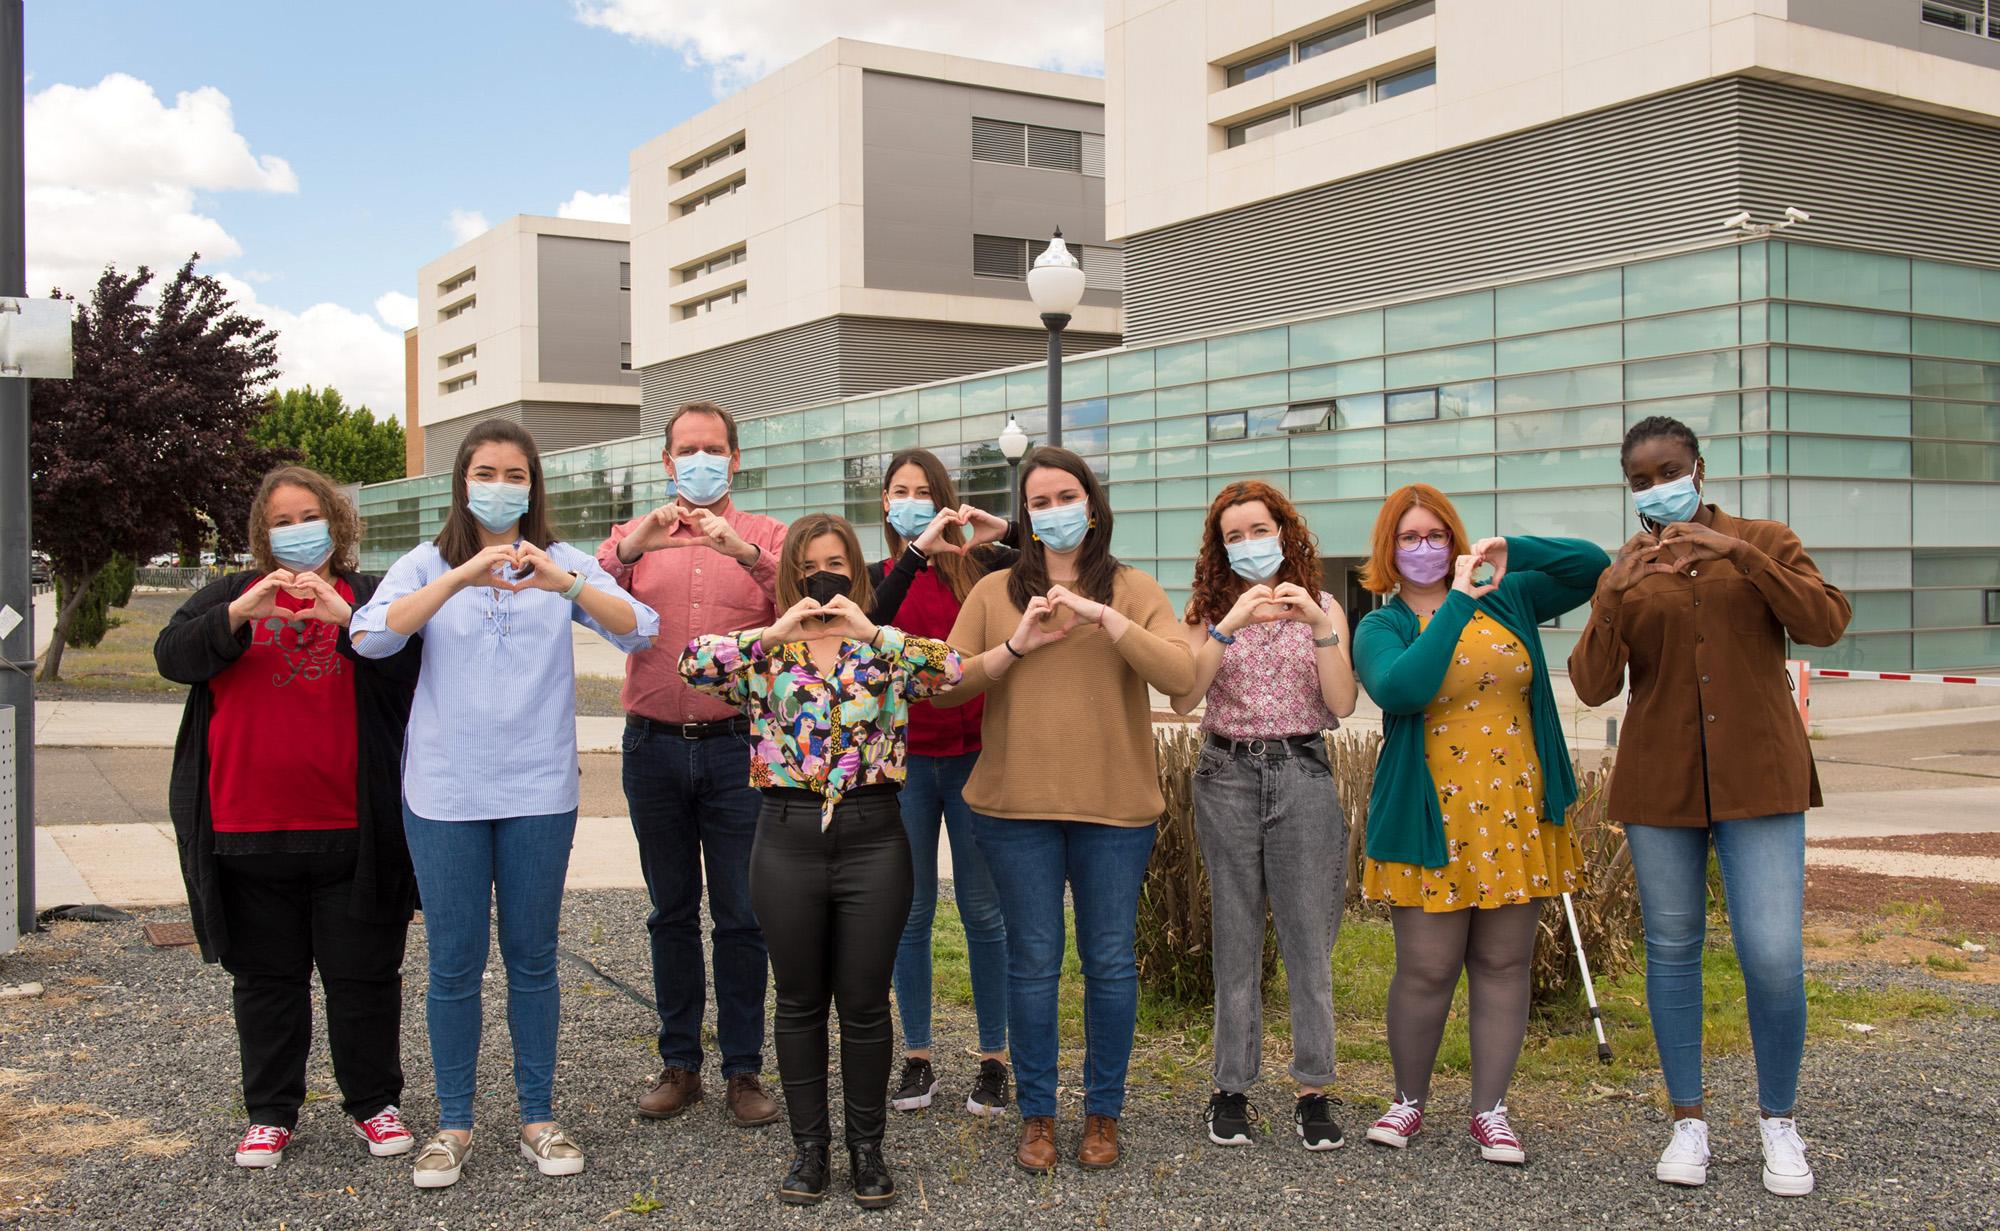 Grupo de Investigación de Neuroinmuno-Reparación del Hospital Nacional de Parapléjicos (Foto:Carlos Monroy // SESCAM)